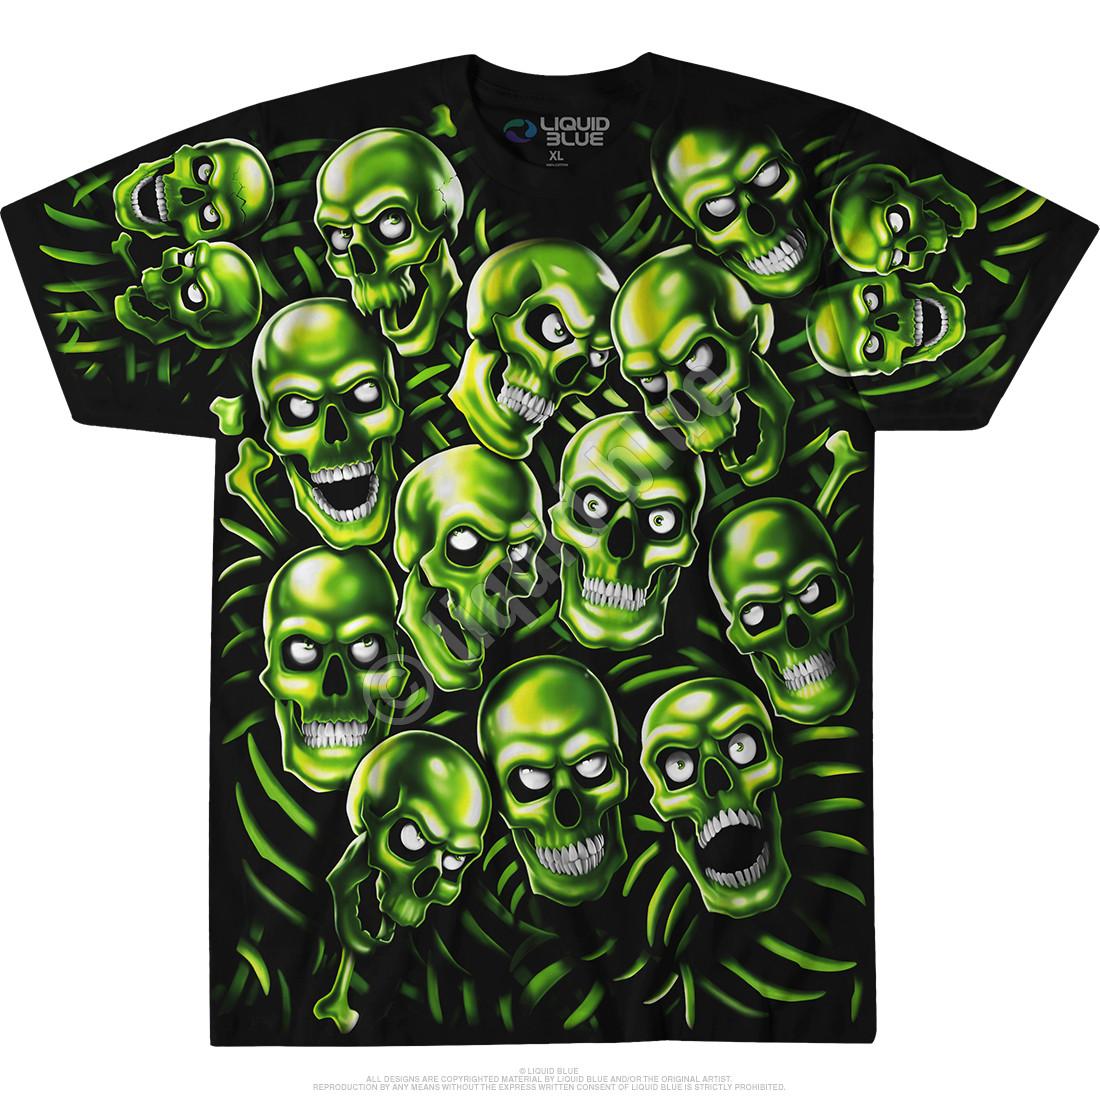 8e3e2fa7a1d Skull Pile Green Black T-Shirt Tee Liquid Blue Juicy J Travis Scott